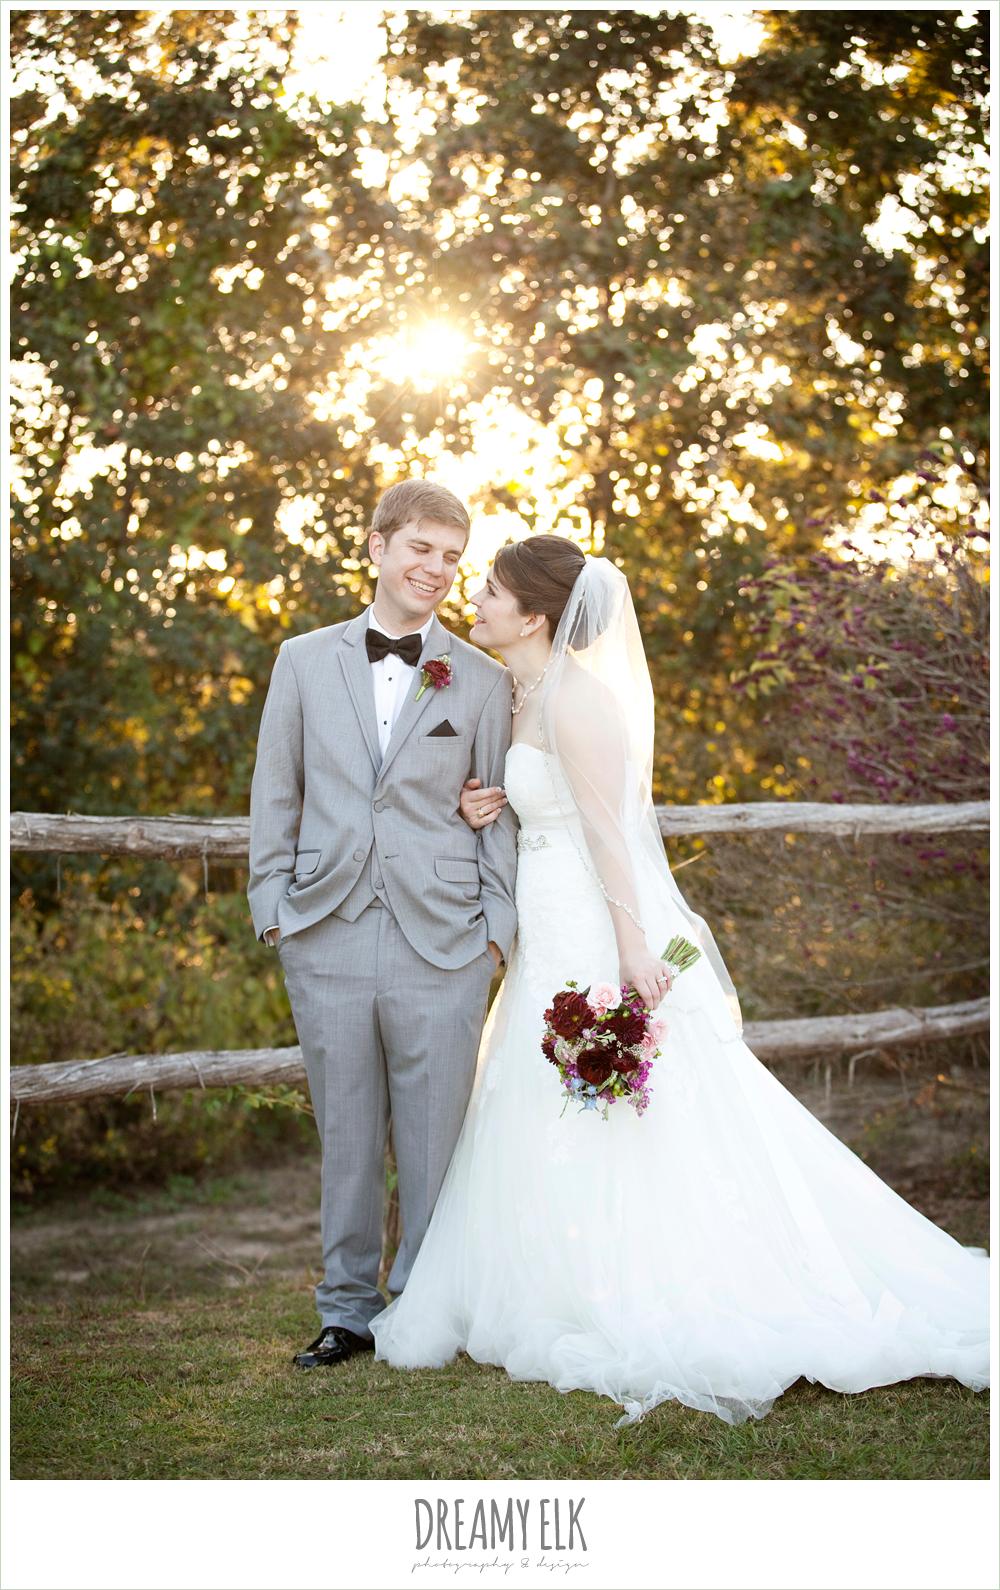 laura & ryan, the wedding photo contest